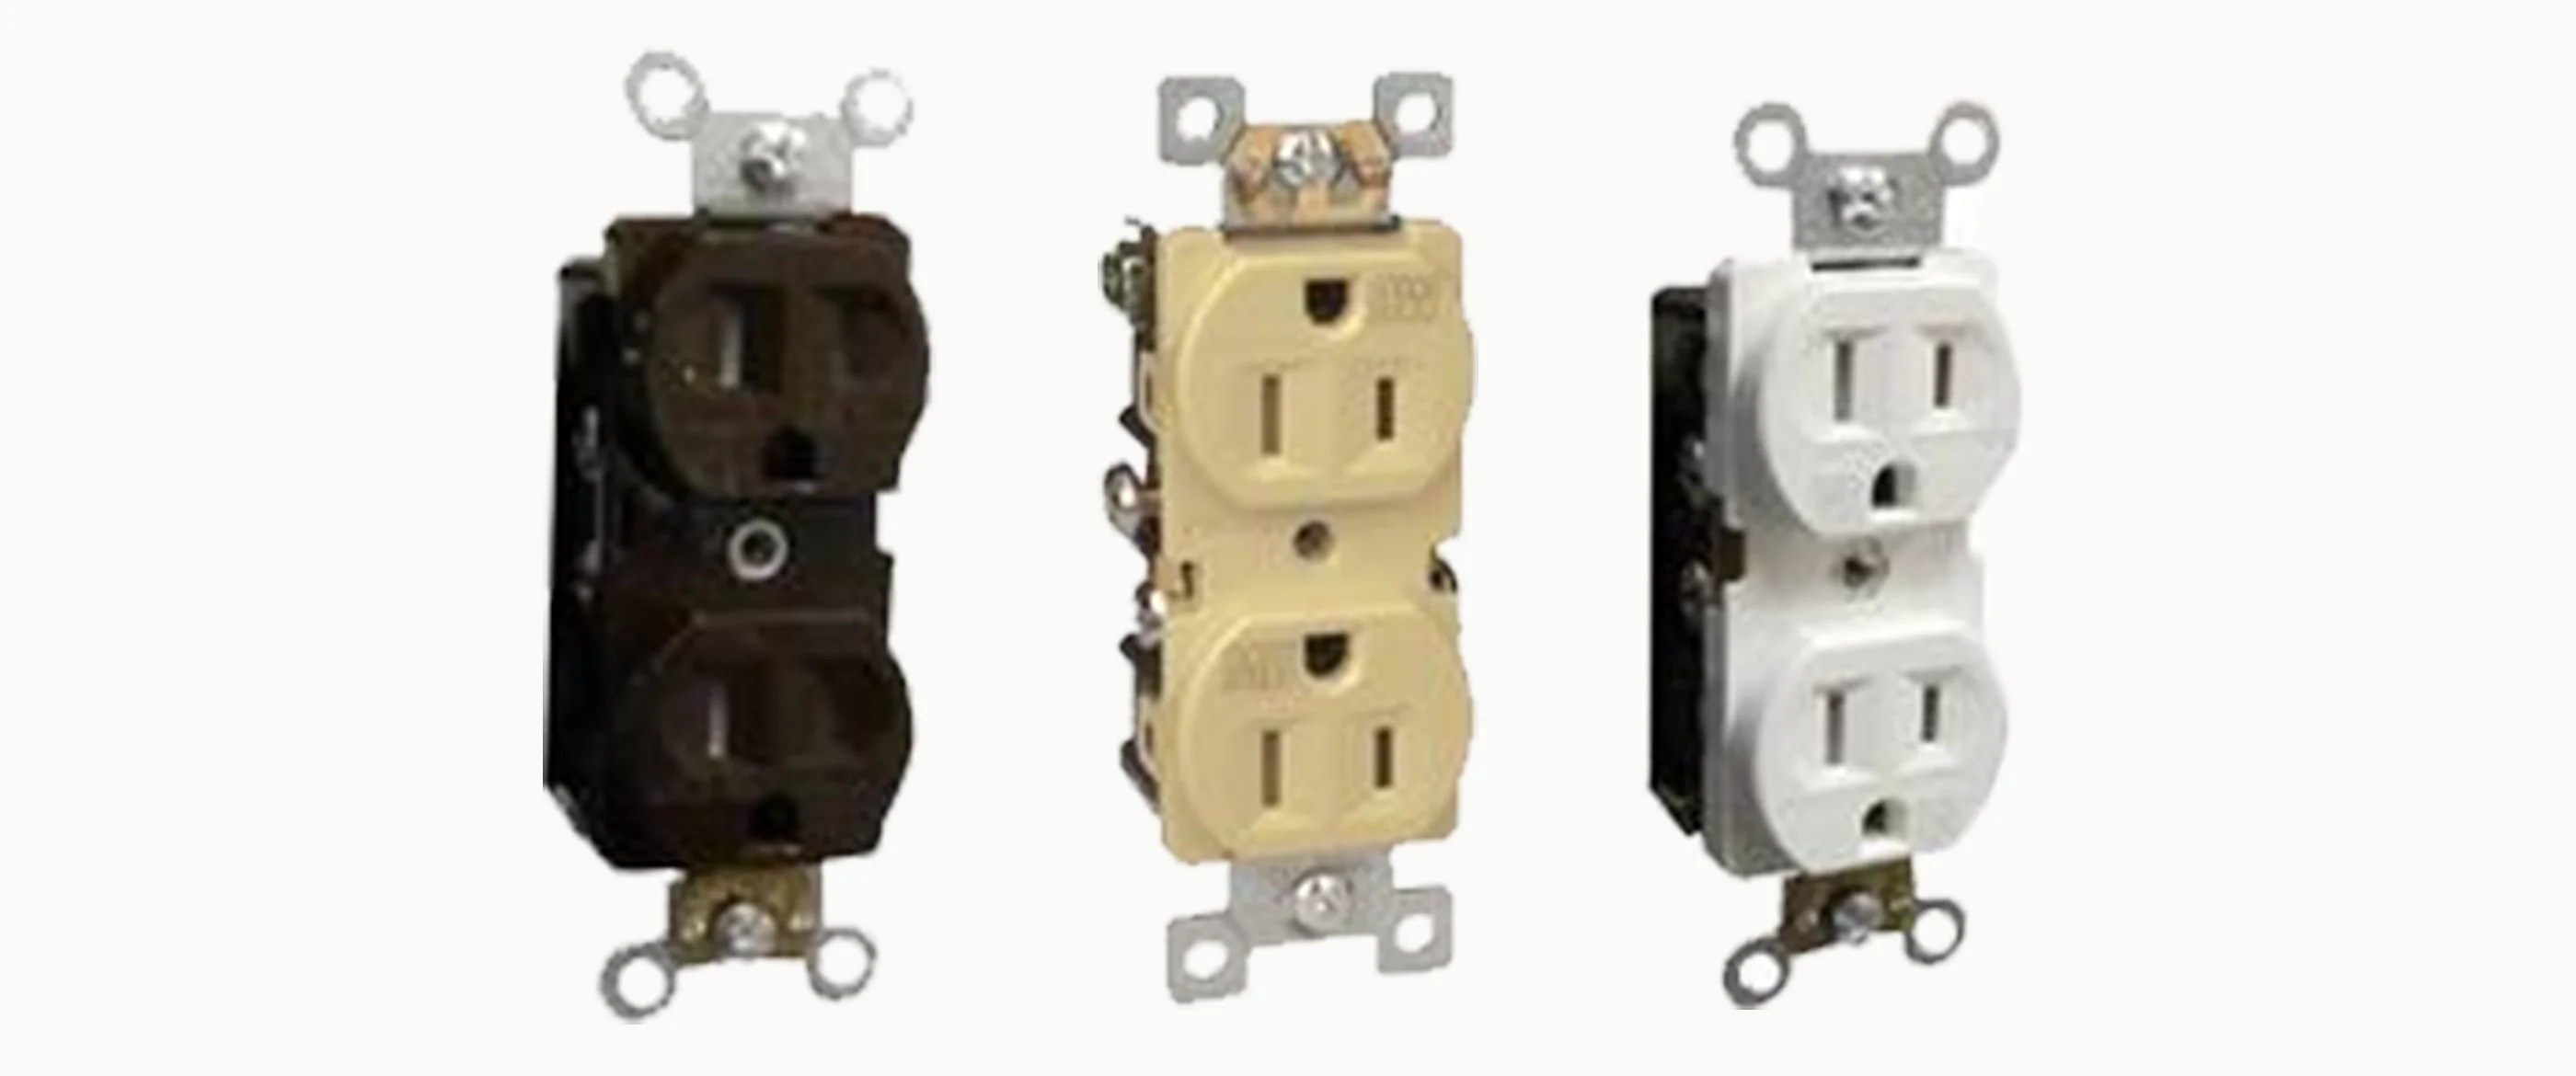 hight resolution of  duplex wiring diagram for duplex receptacle on duplex switch receptacle ungrounded duplex with usb